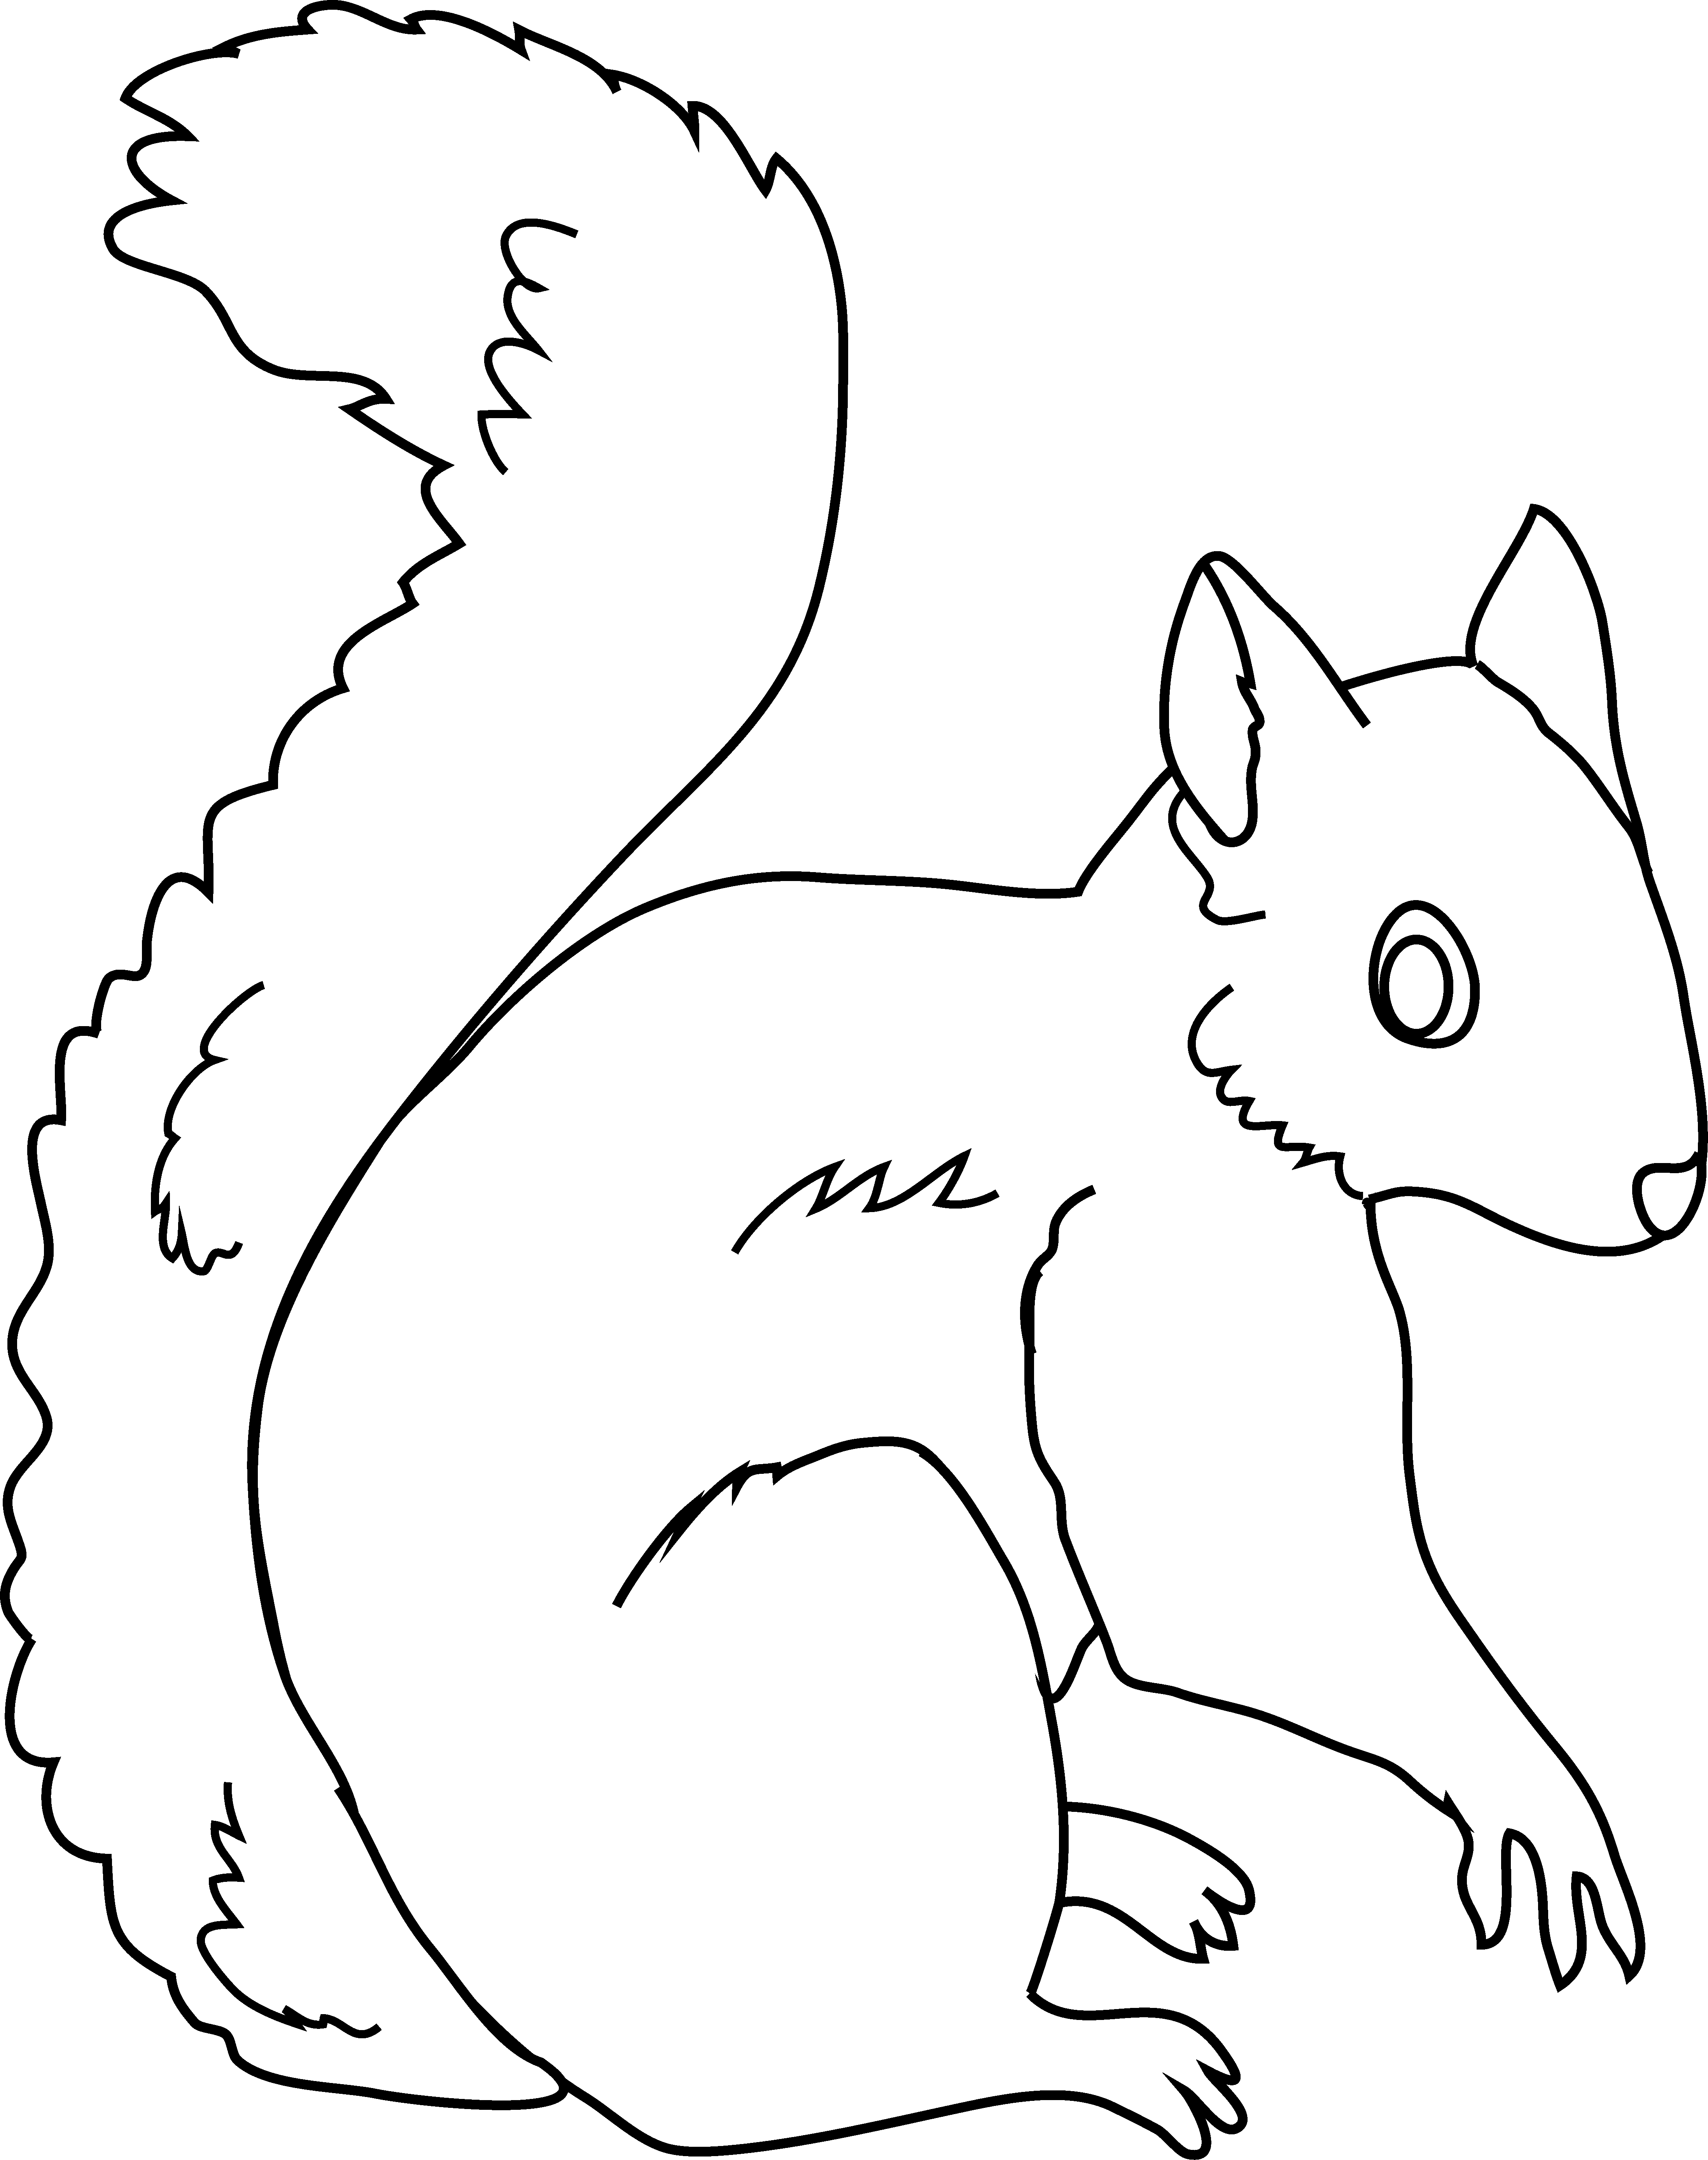 Clipart squirrel color. Coloring page free clip